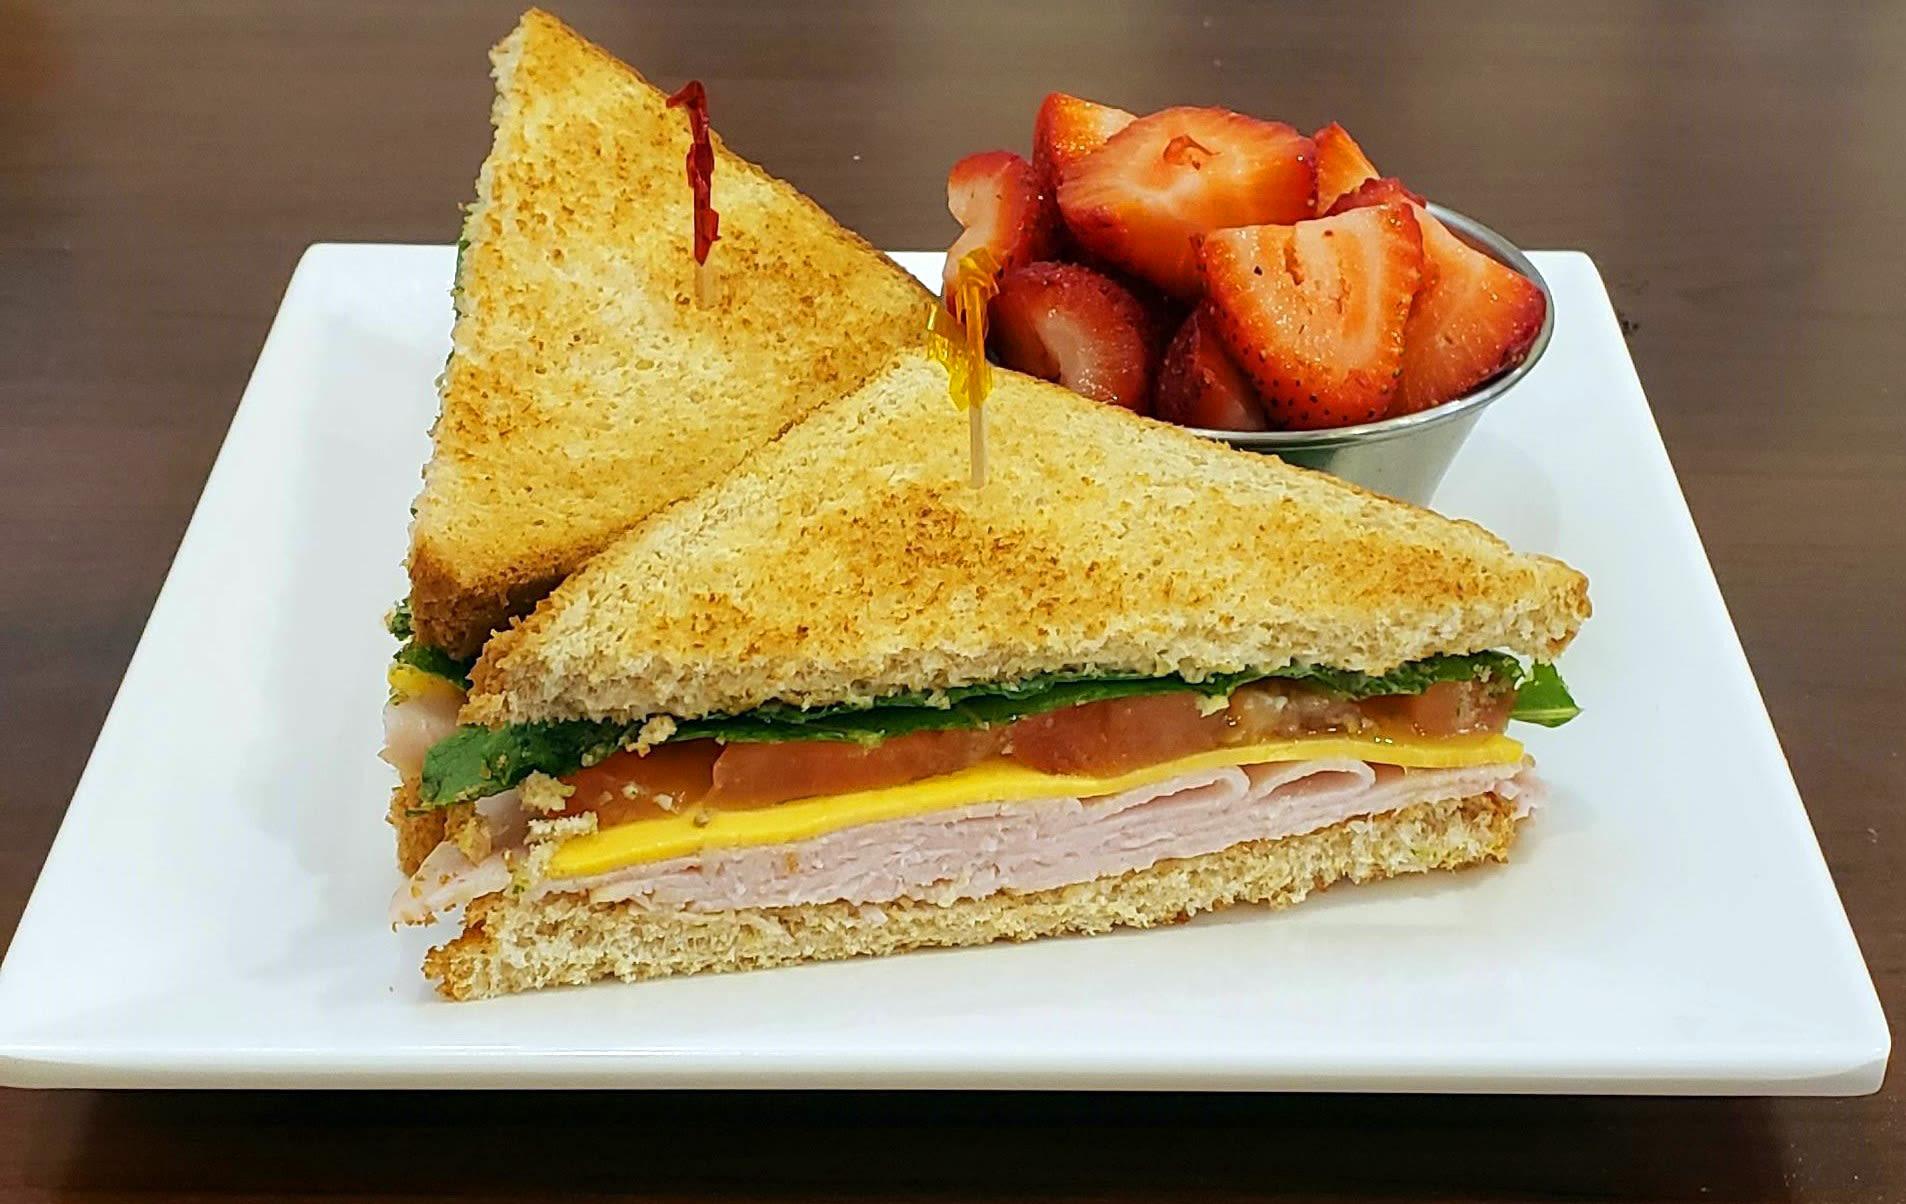 Turkey Sandwich at Blossom Vale Senior Living